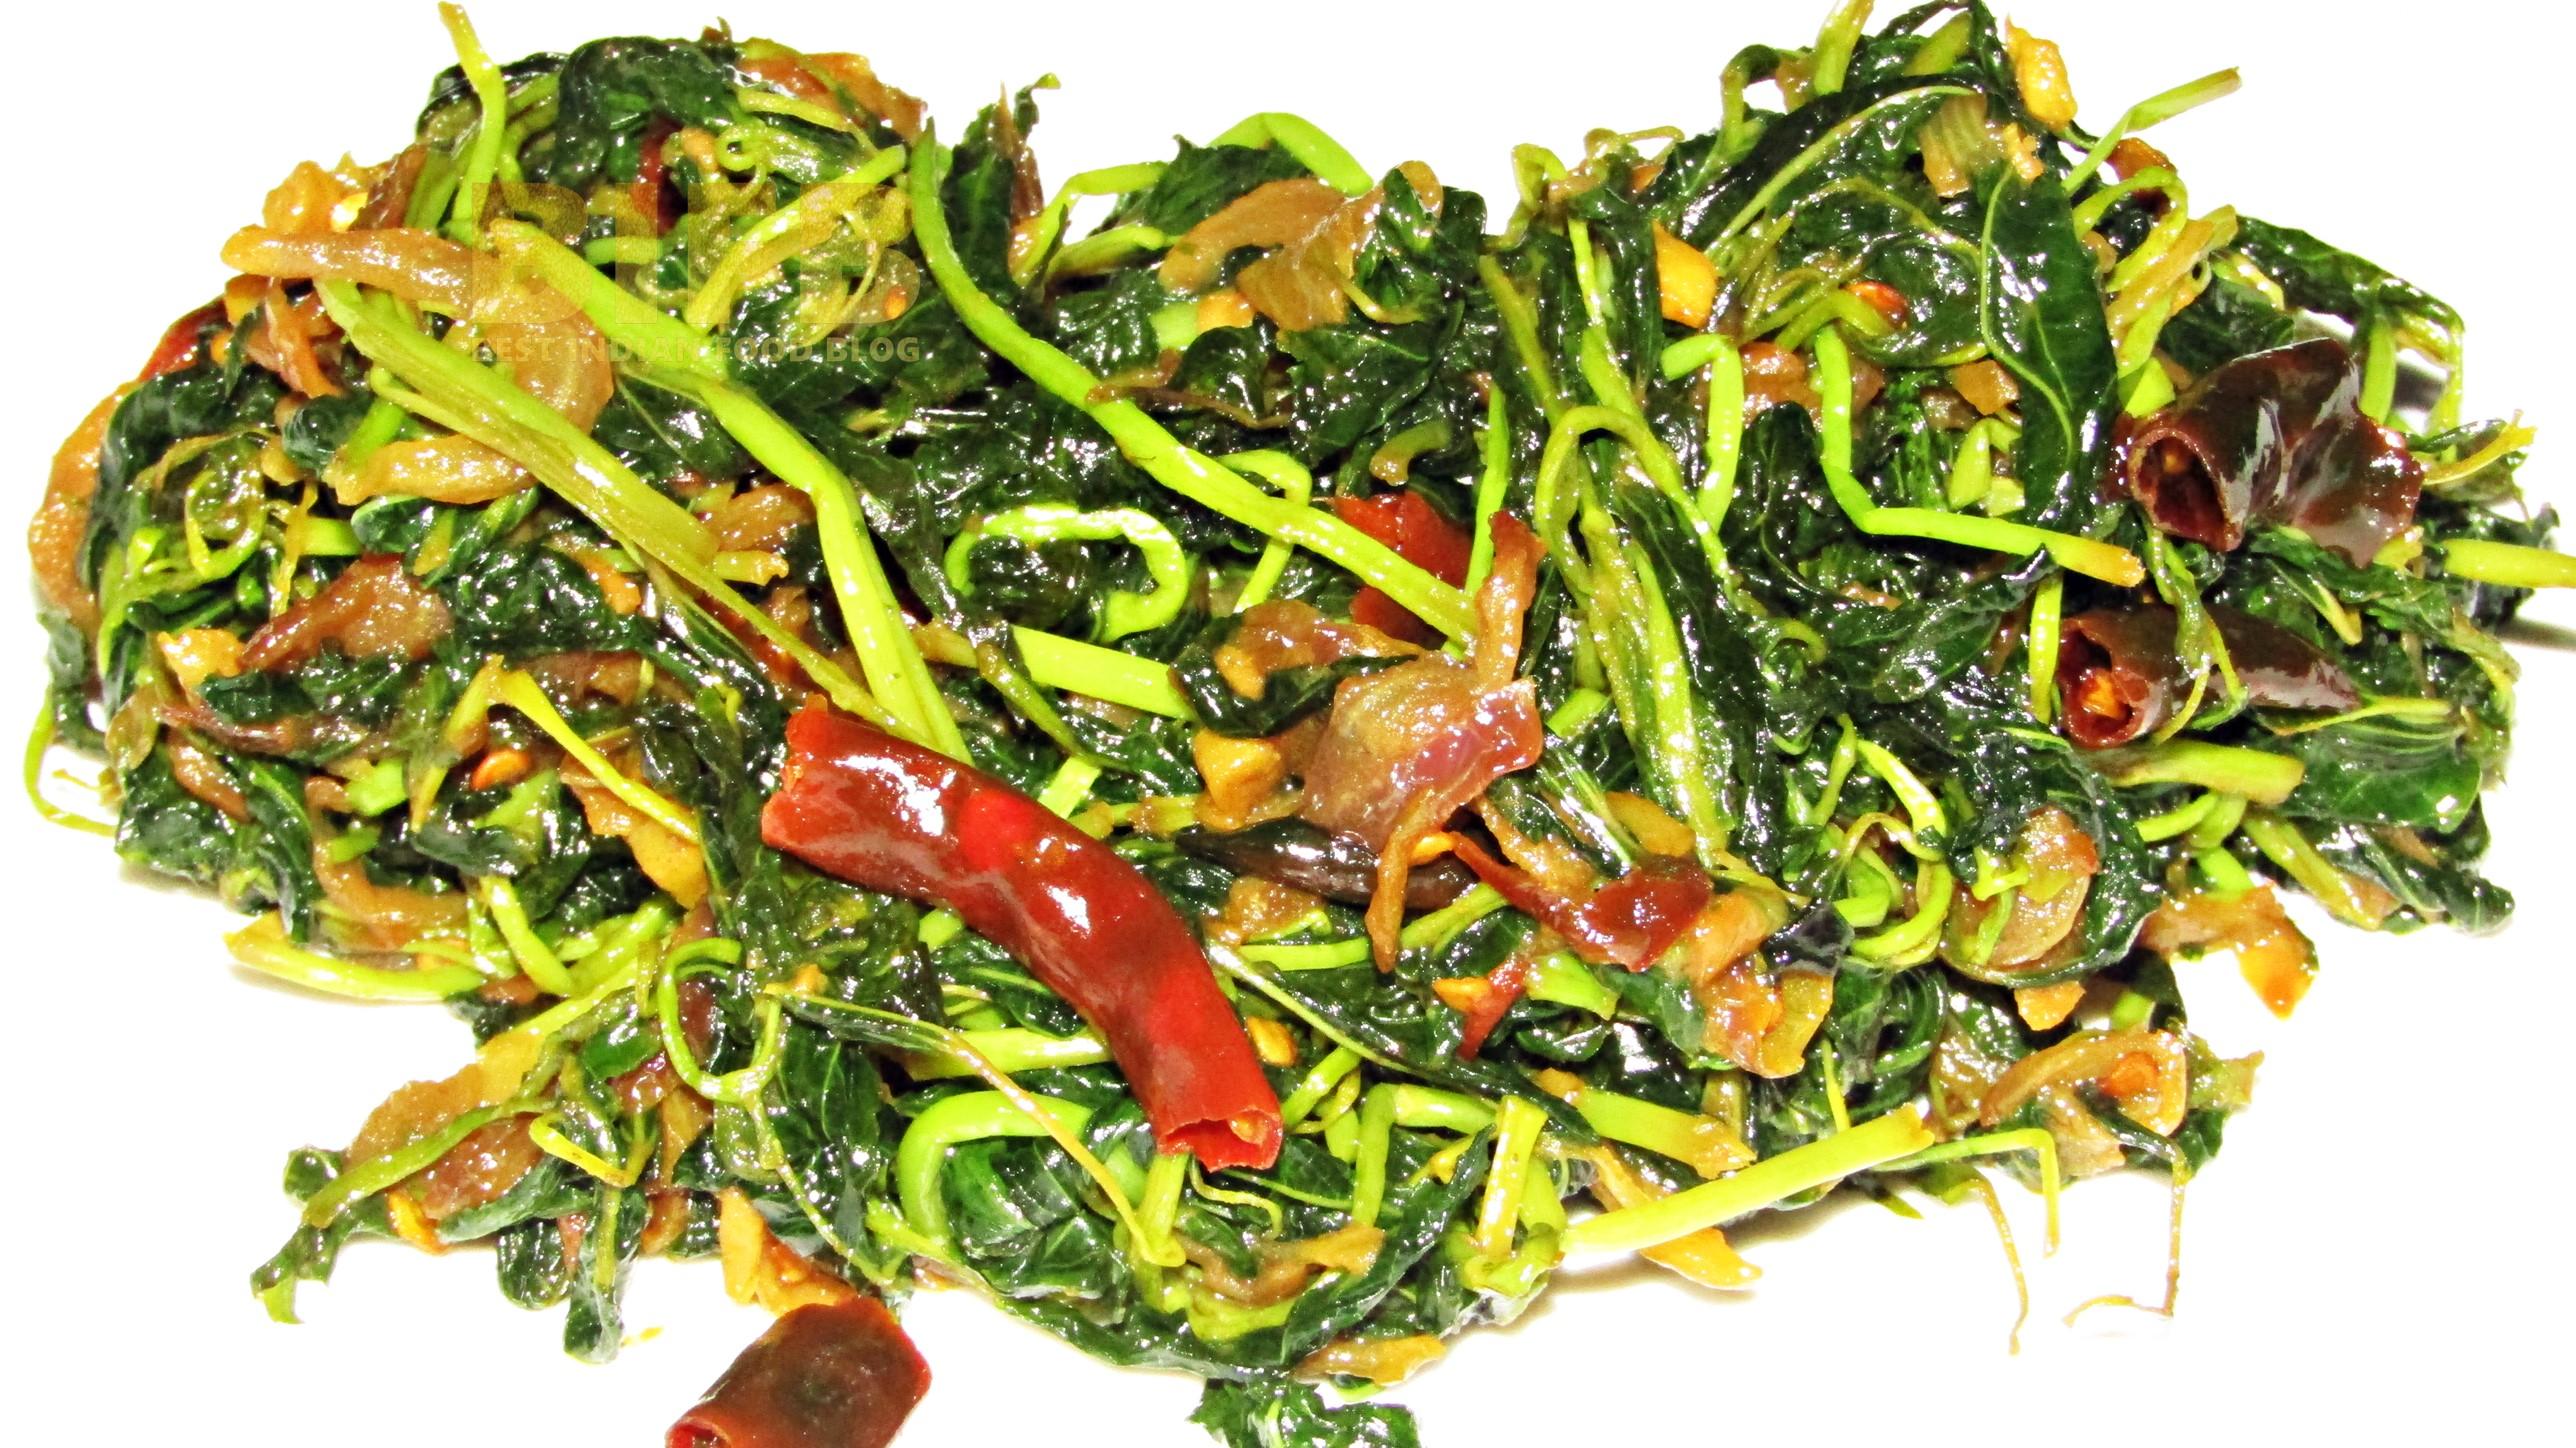 Chech Bhaji from Chhattisgarh, India | Best Indian Food Blog